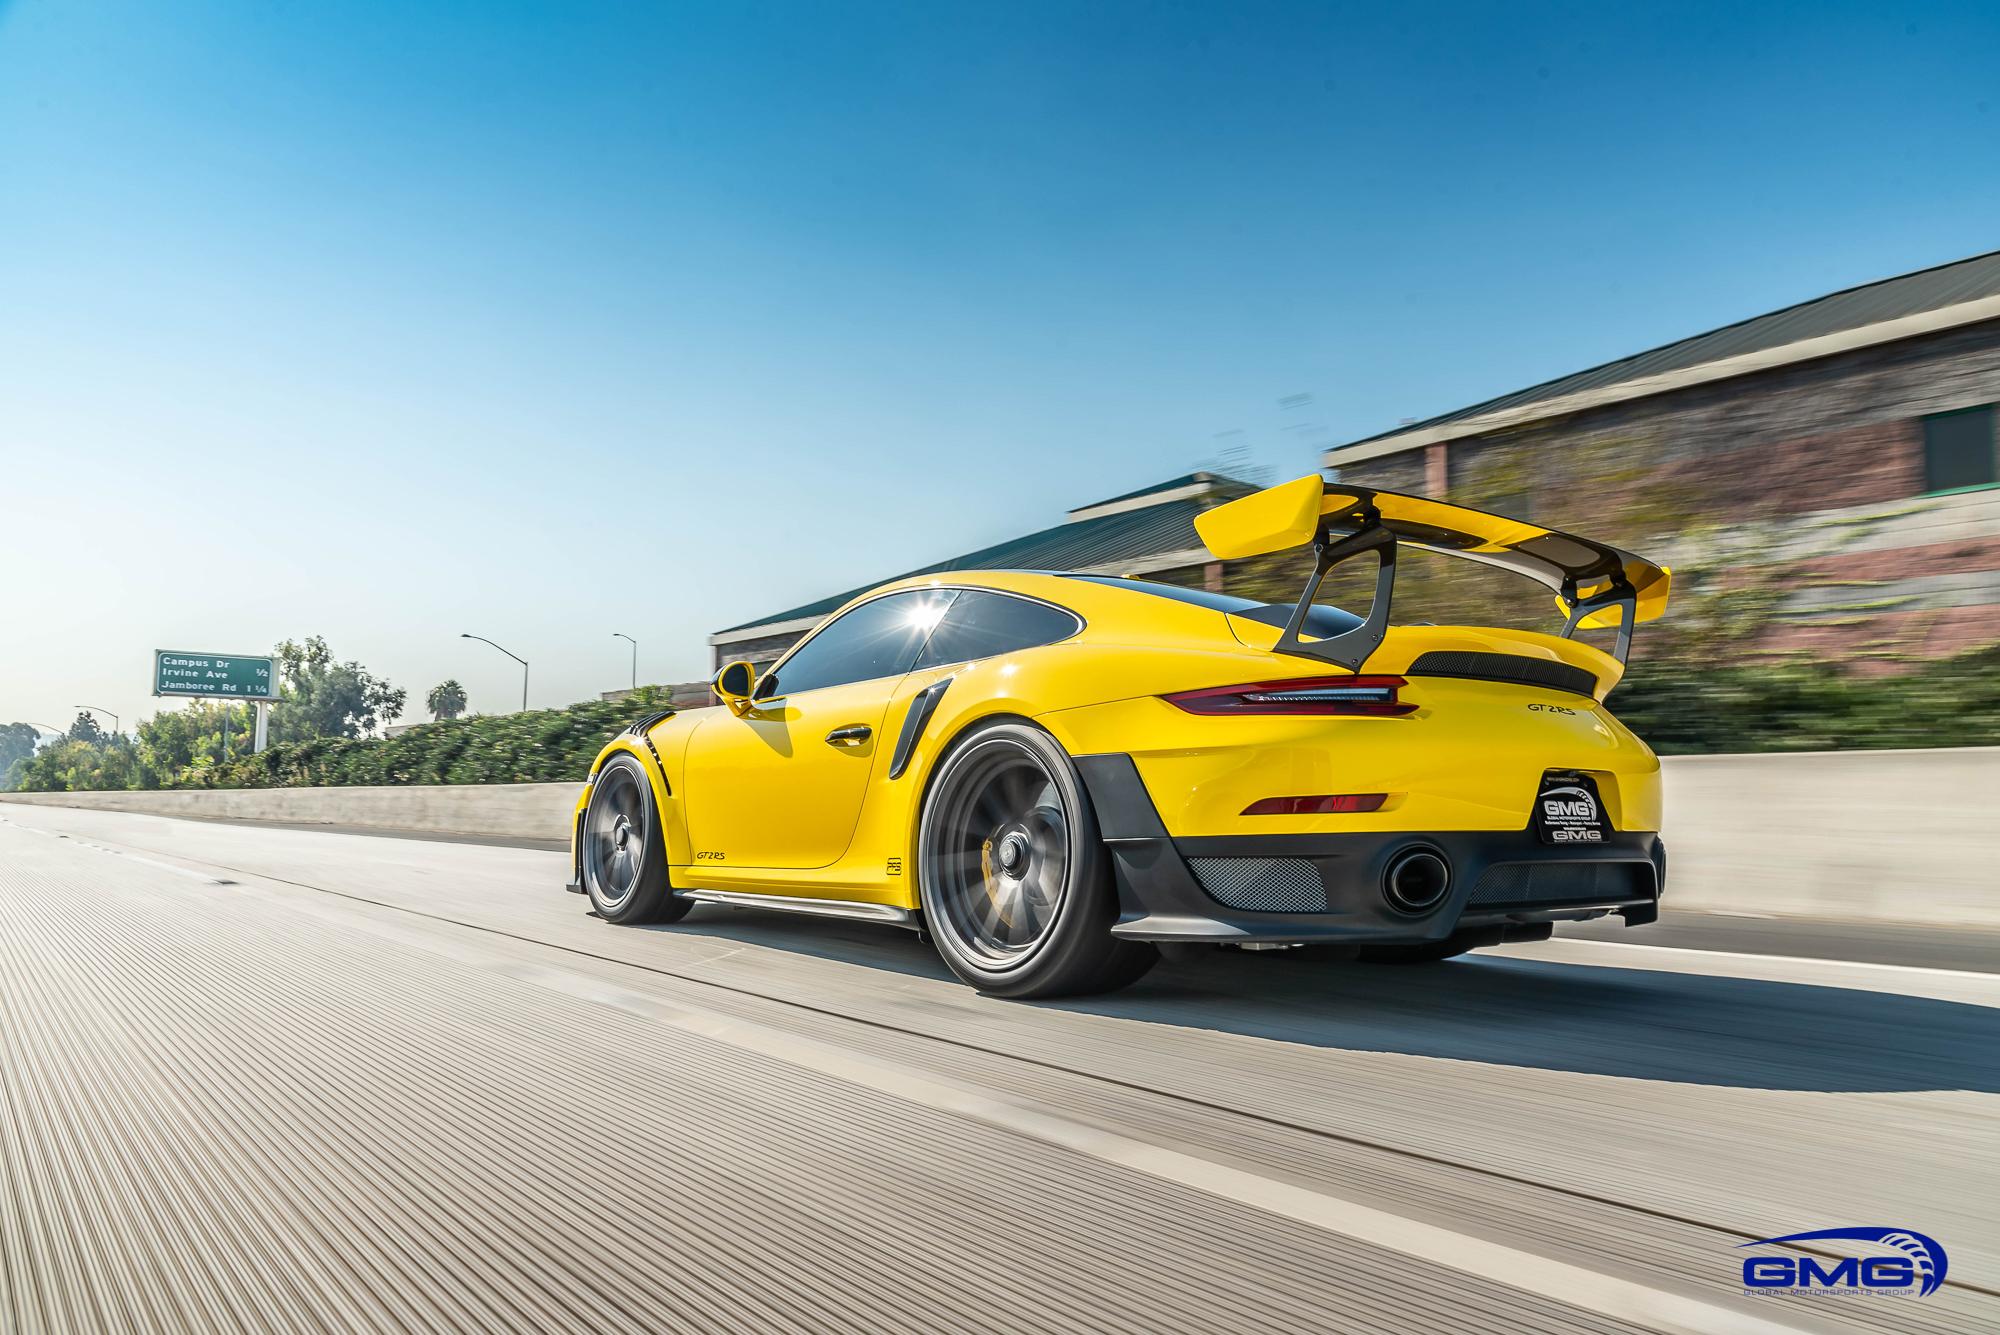 Racing Yellow Porsche 991 GT2 RS